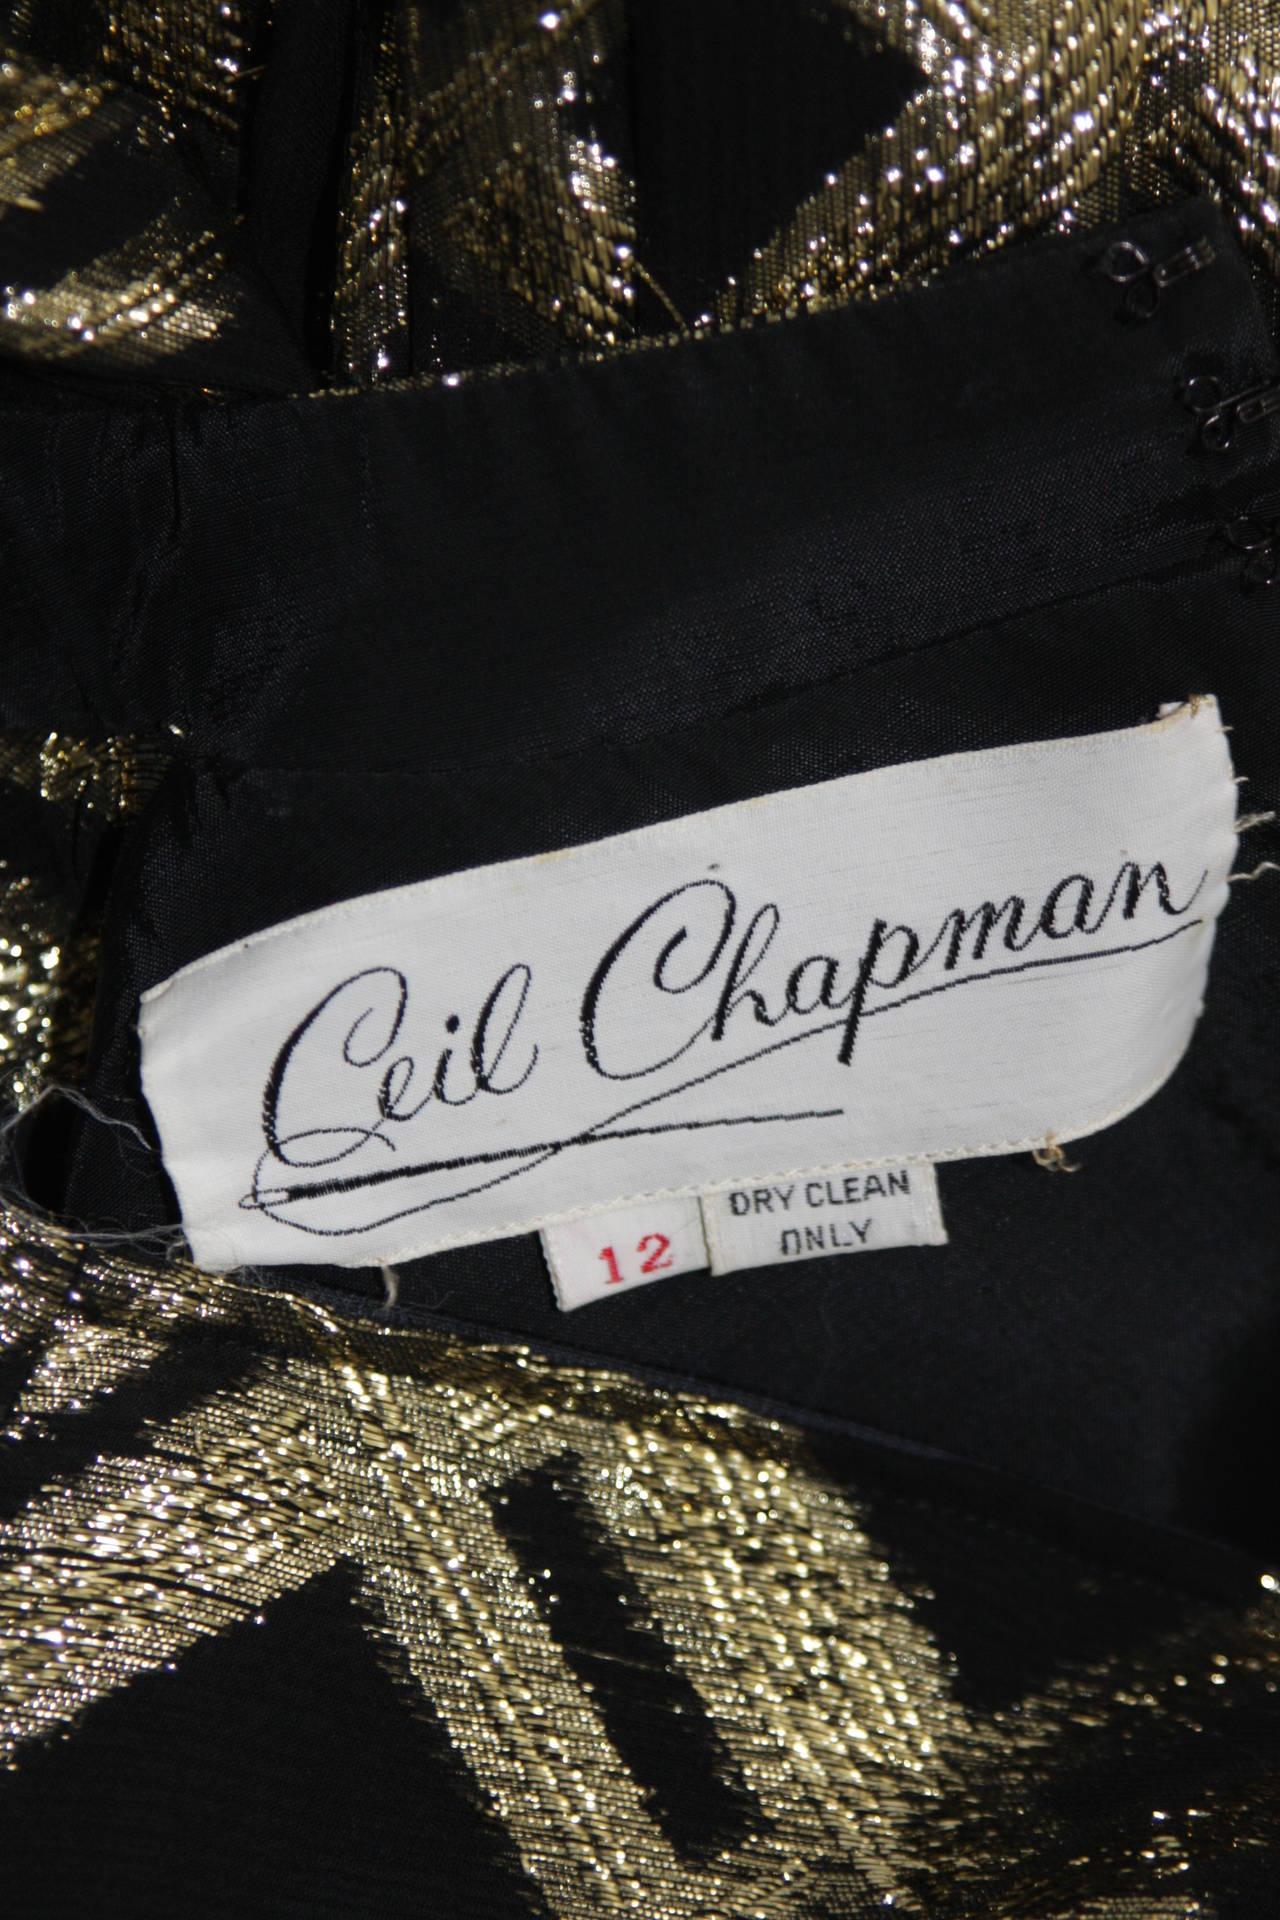 Ceil Chapman Black Silk and Gold Lame Cocktail Dress Size M 10